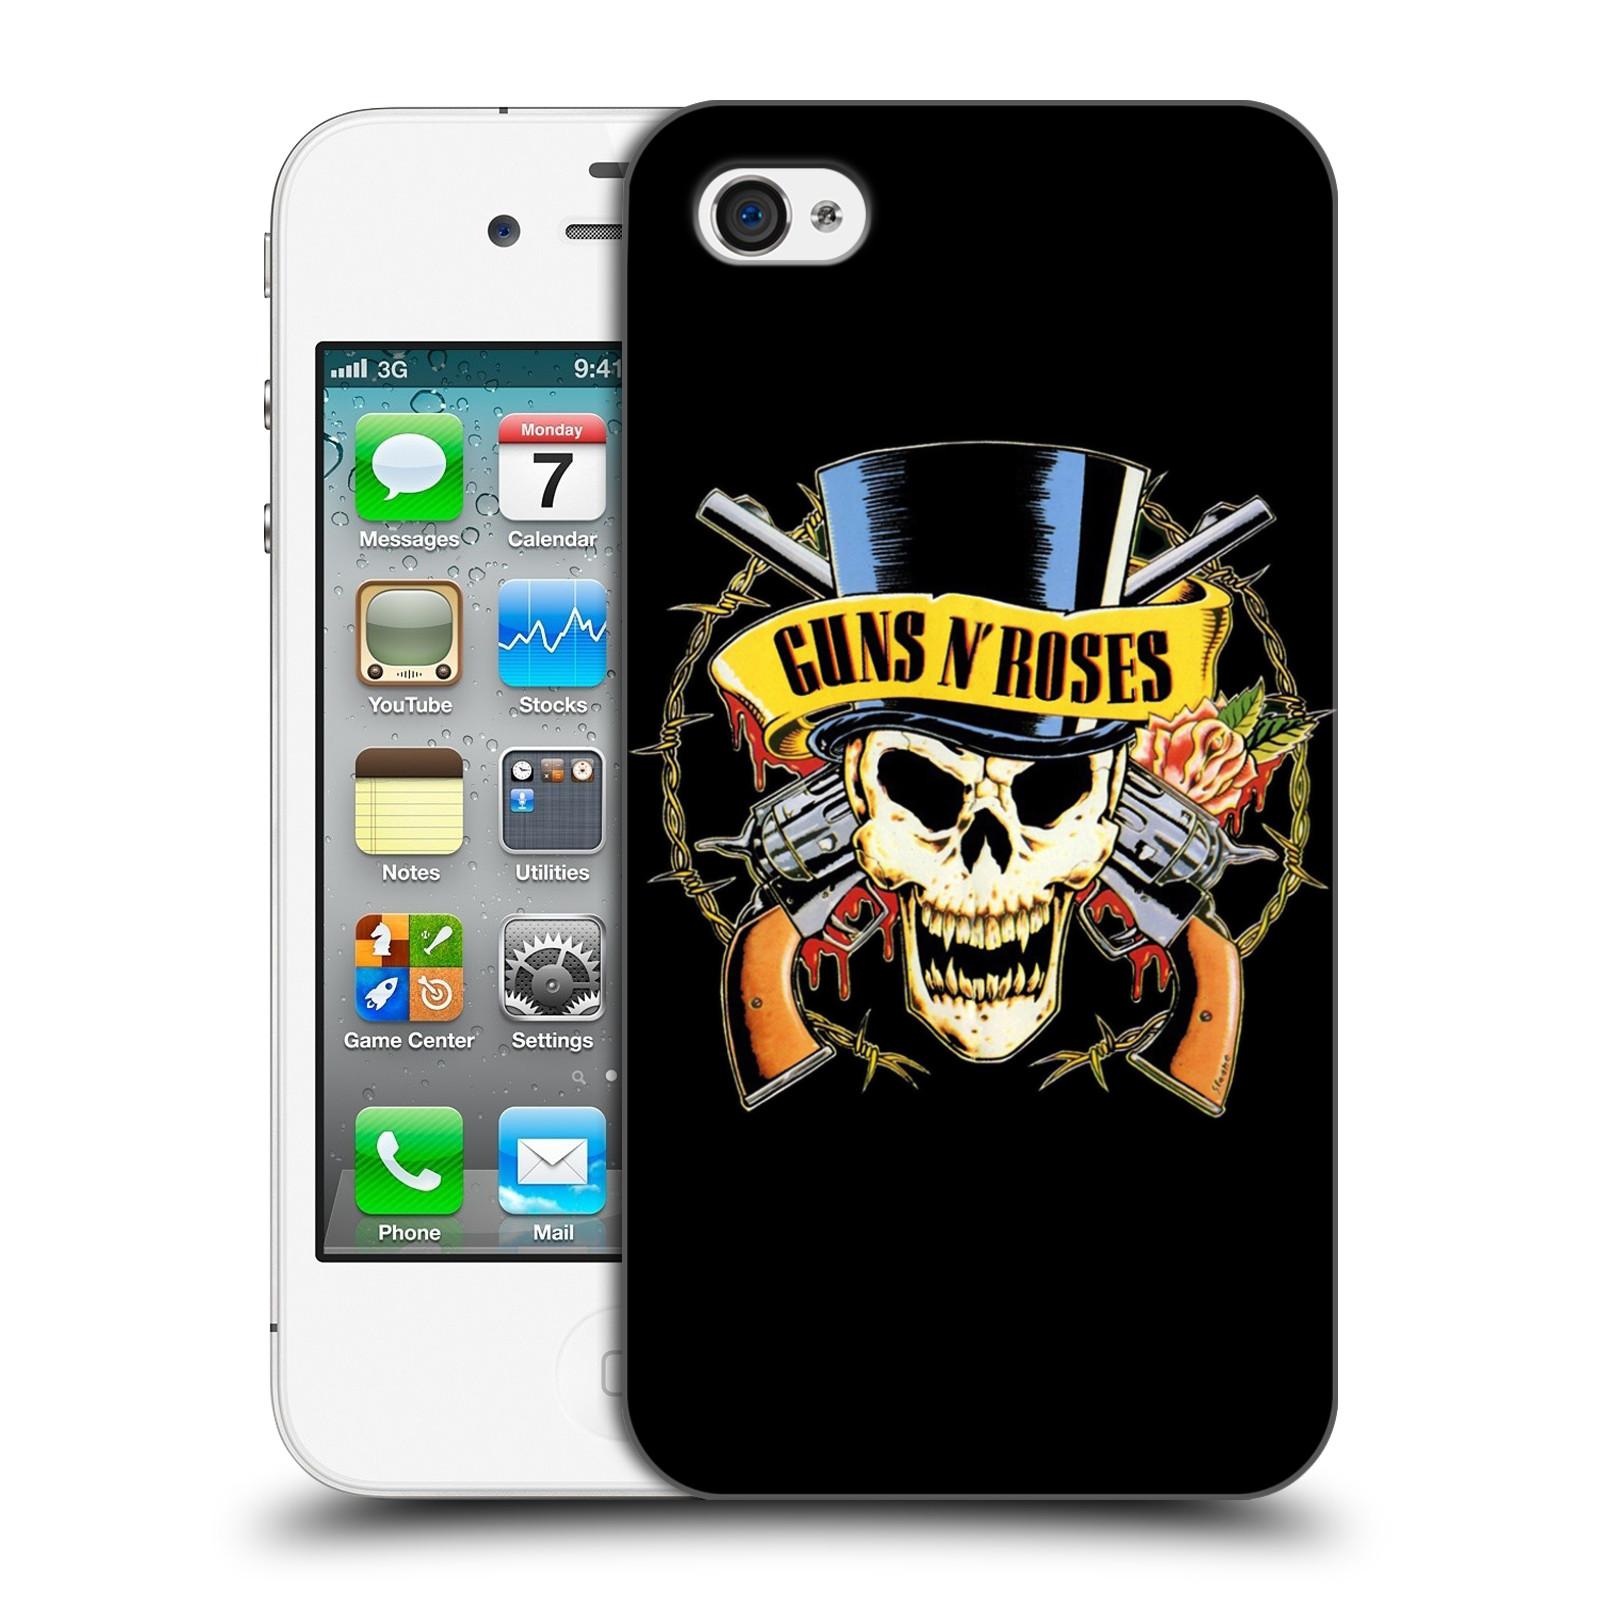 Plastové pouzdro na mobil Apple iPhone 4 a 4S HEAD CASE Guns N' Roses - Lebka